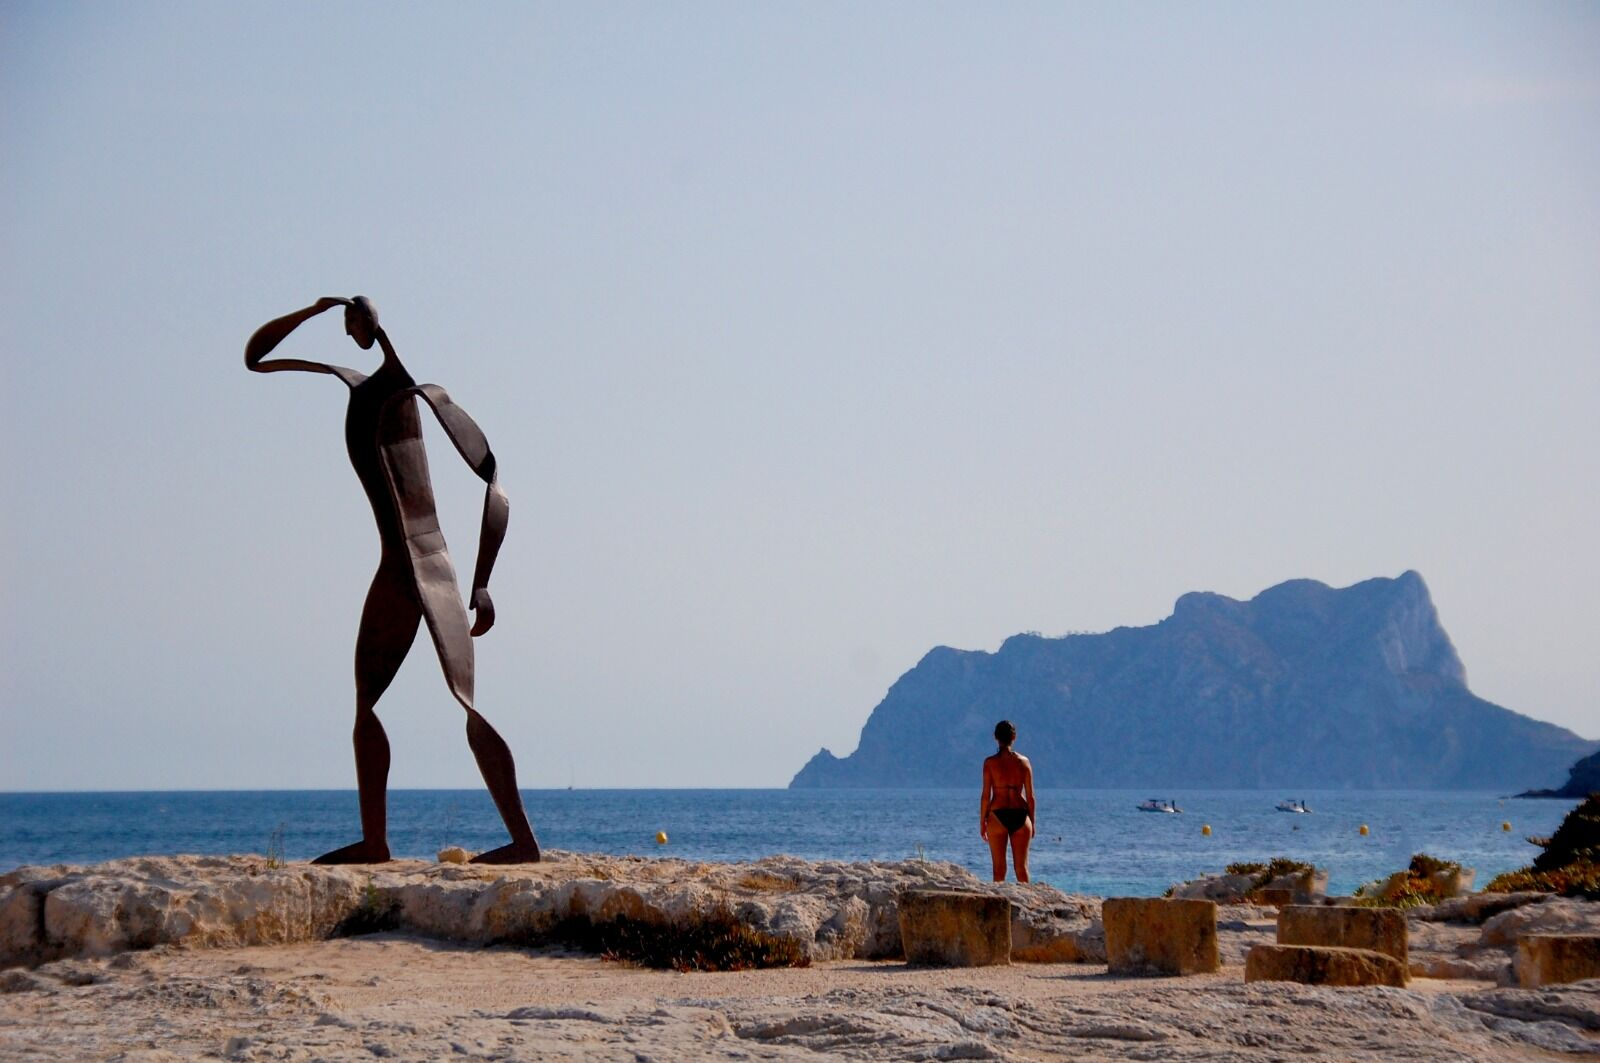 Moraira statue and Calpe Roack